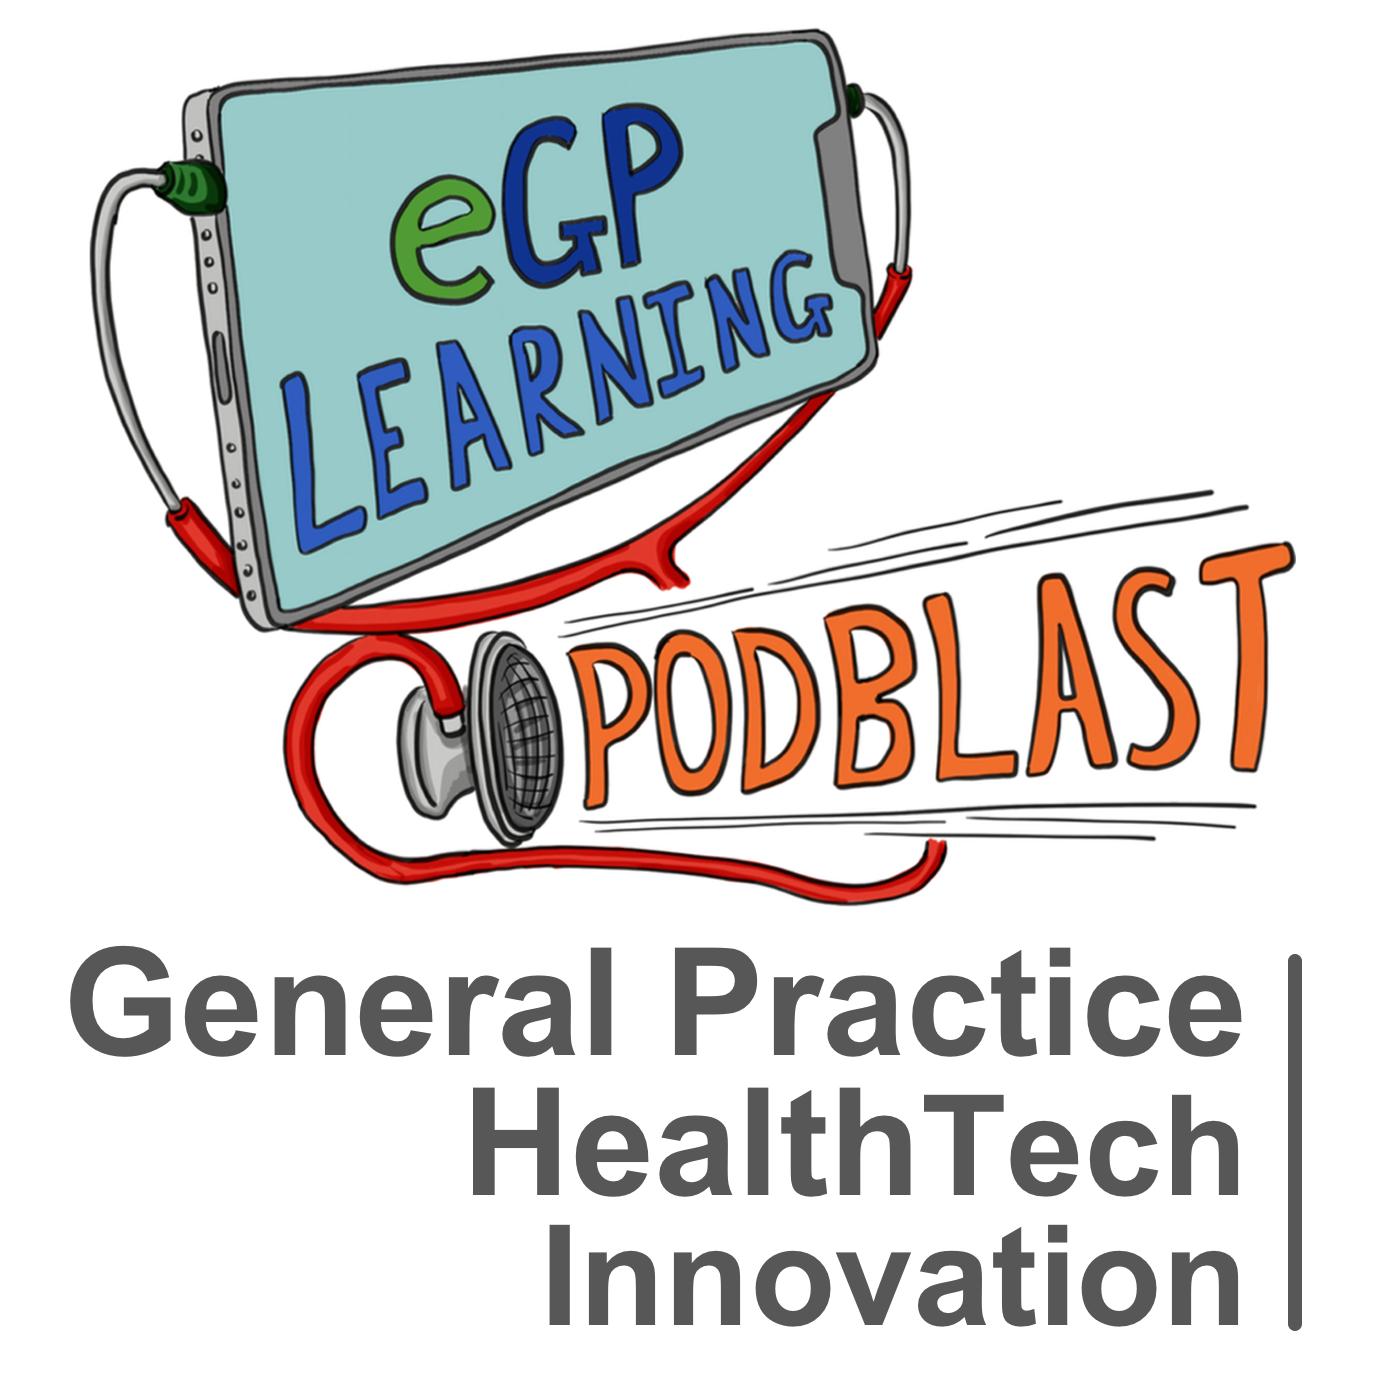 https://itunes.apple.com/gb/podcast/egplearning-podblast/id1325540249?mt=2